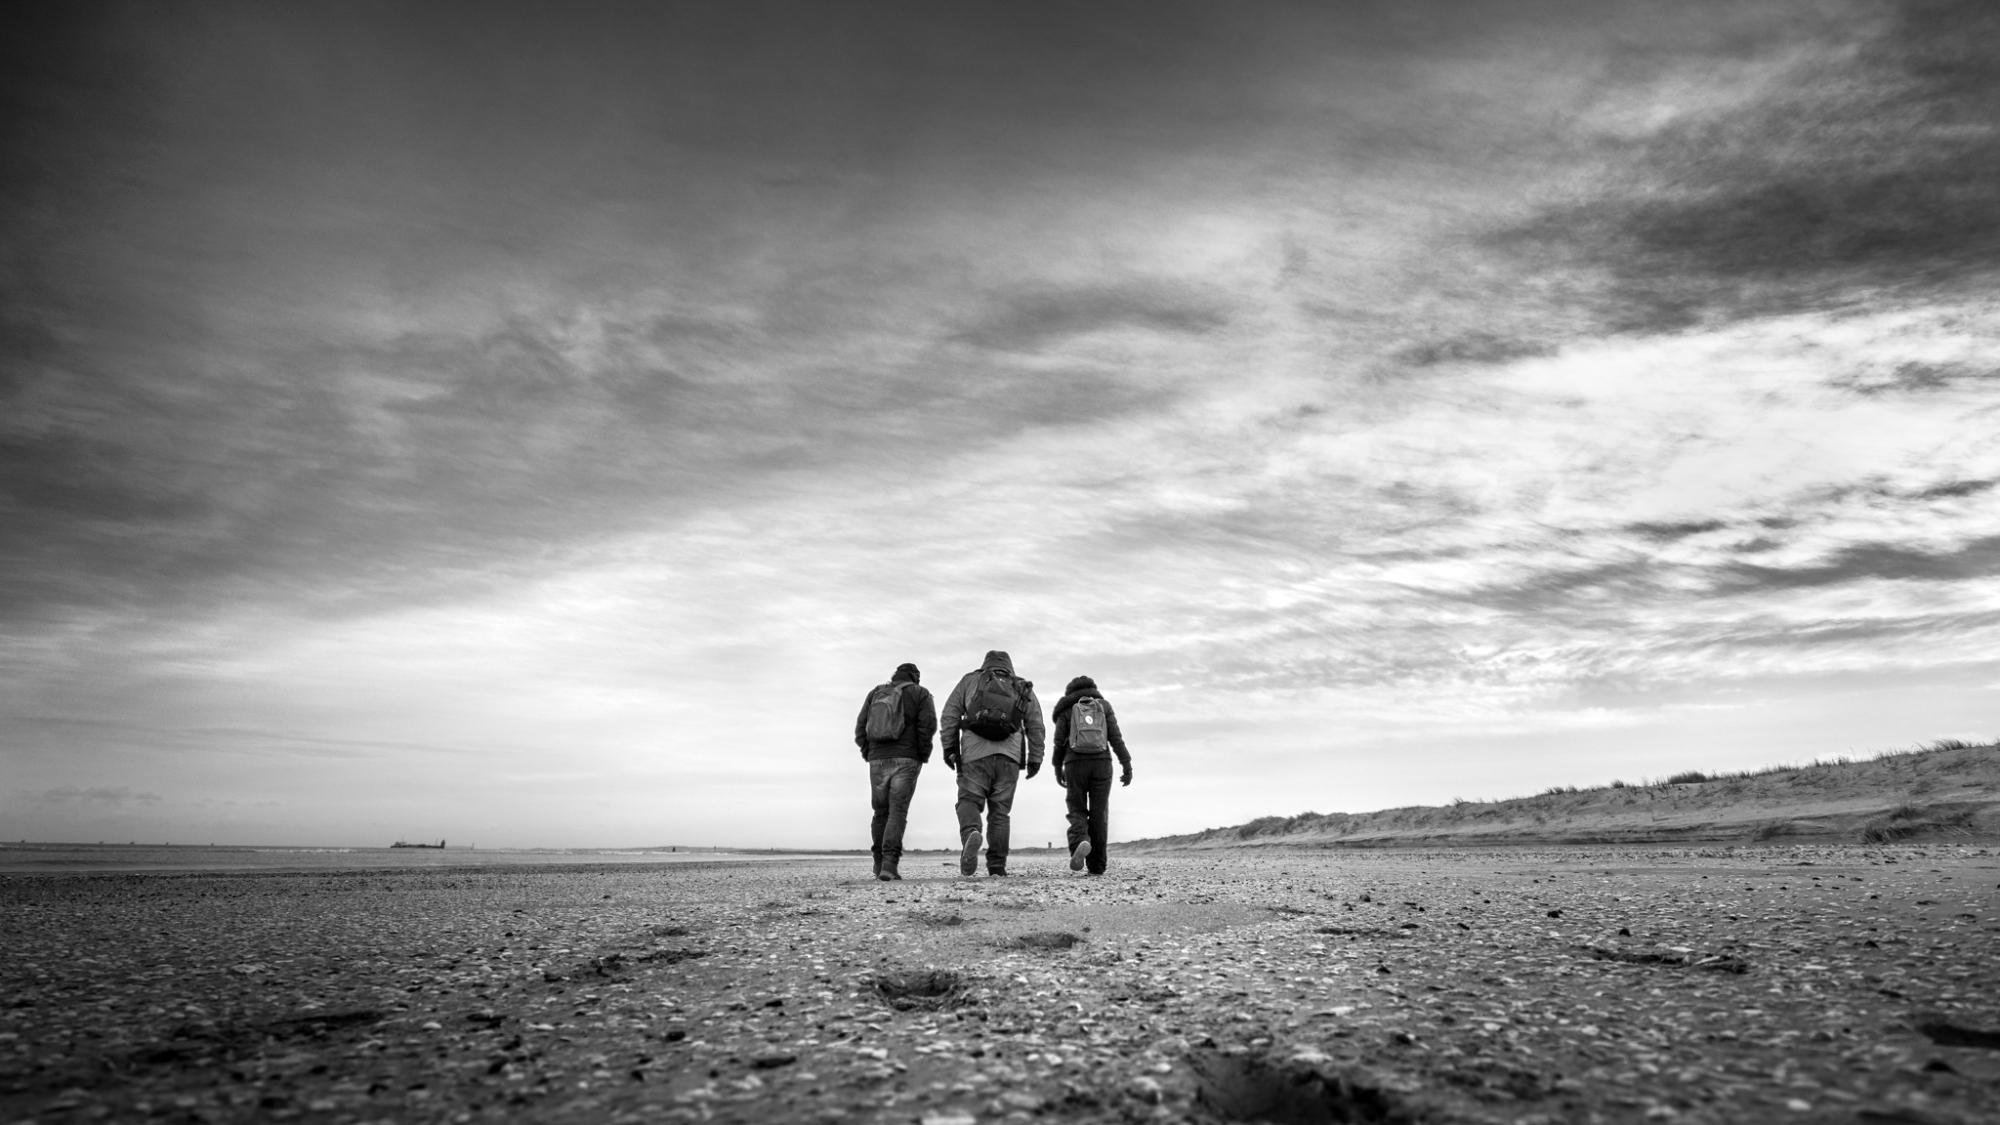 3 people with backpacks walking towards horizon